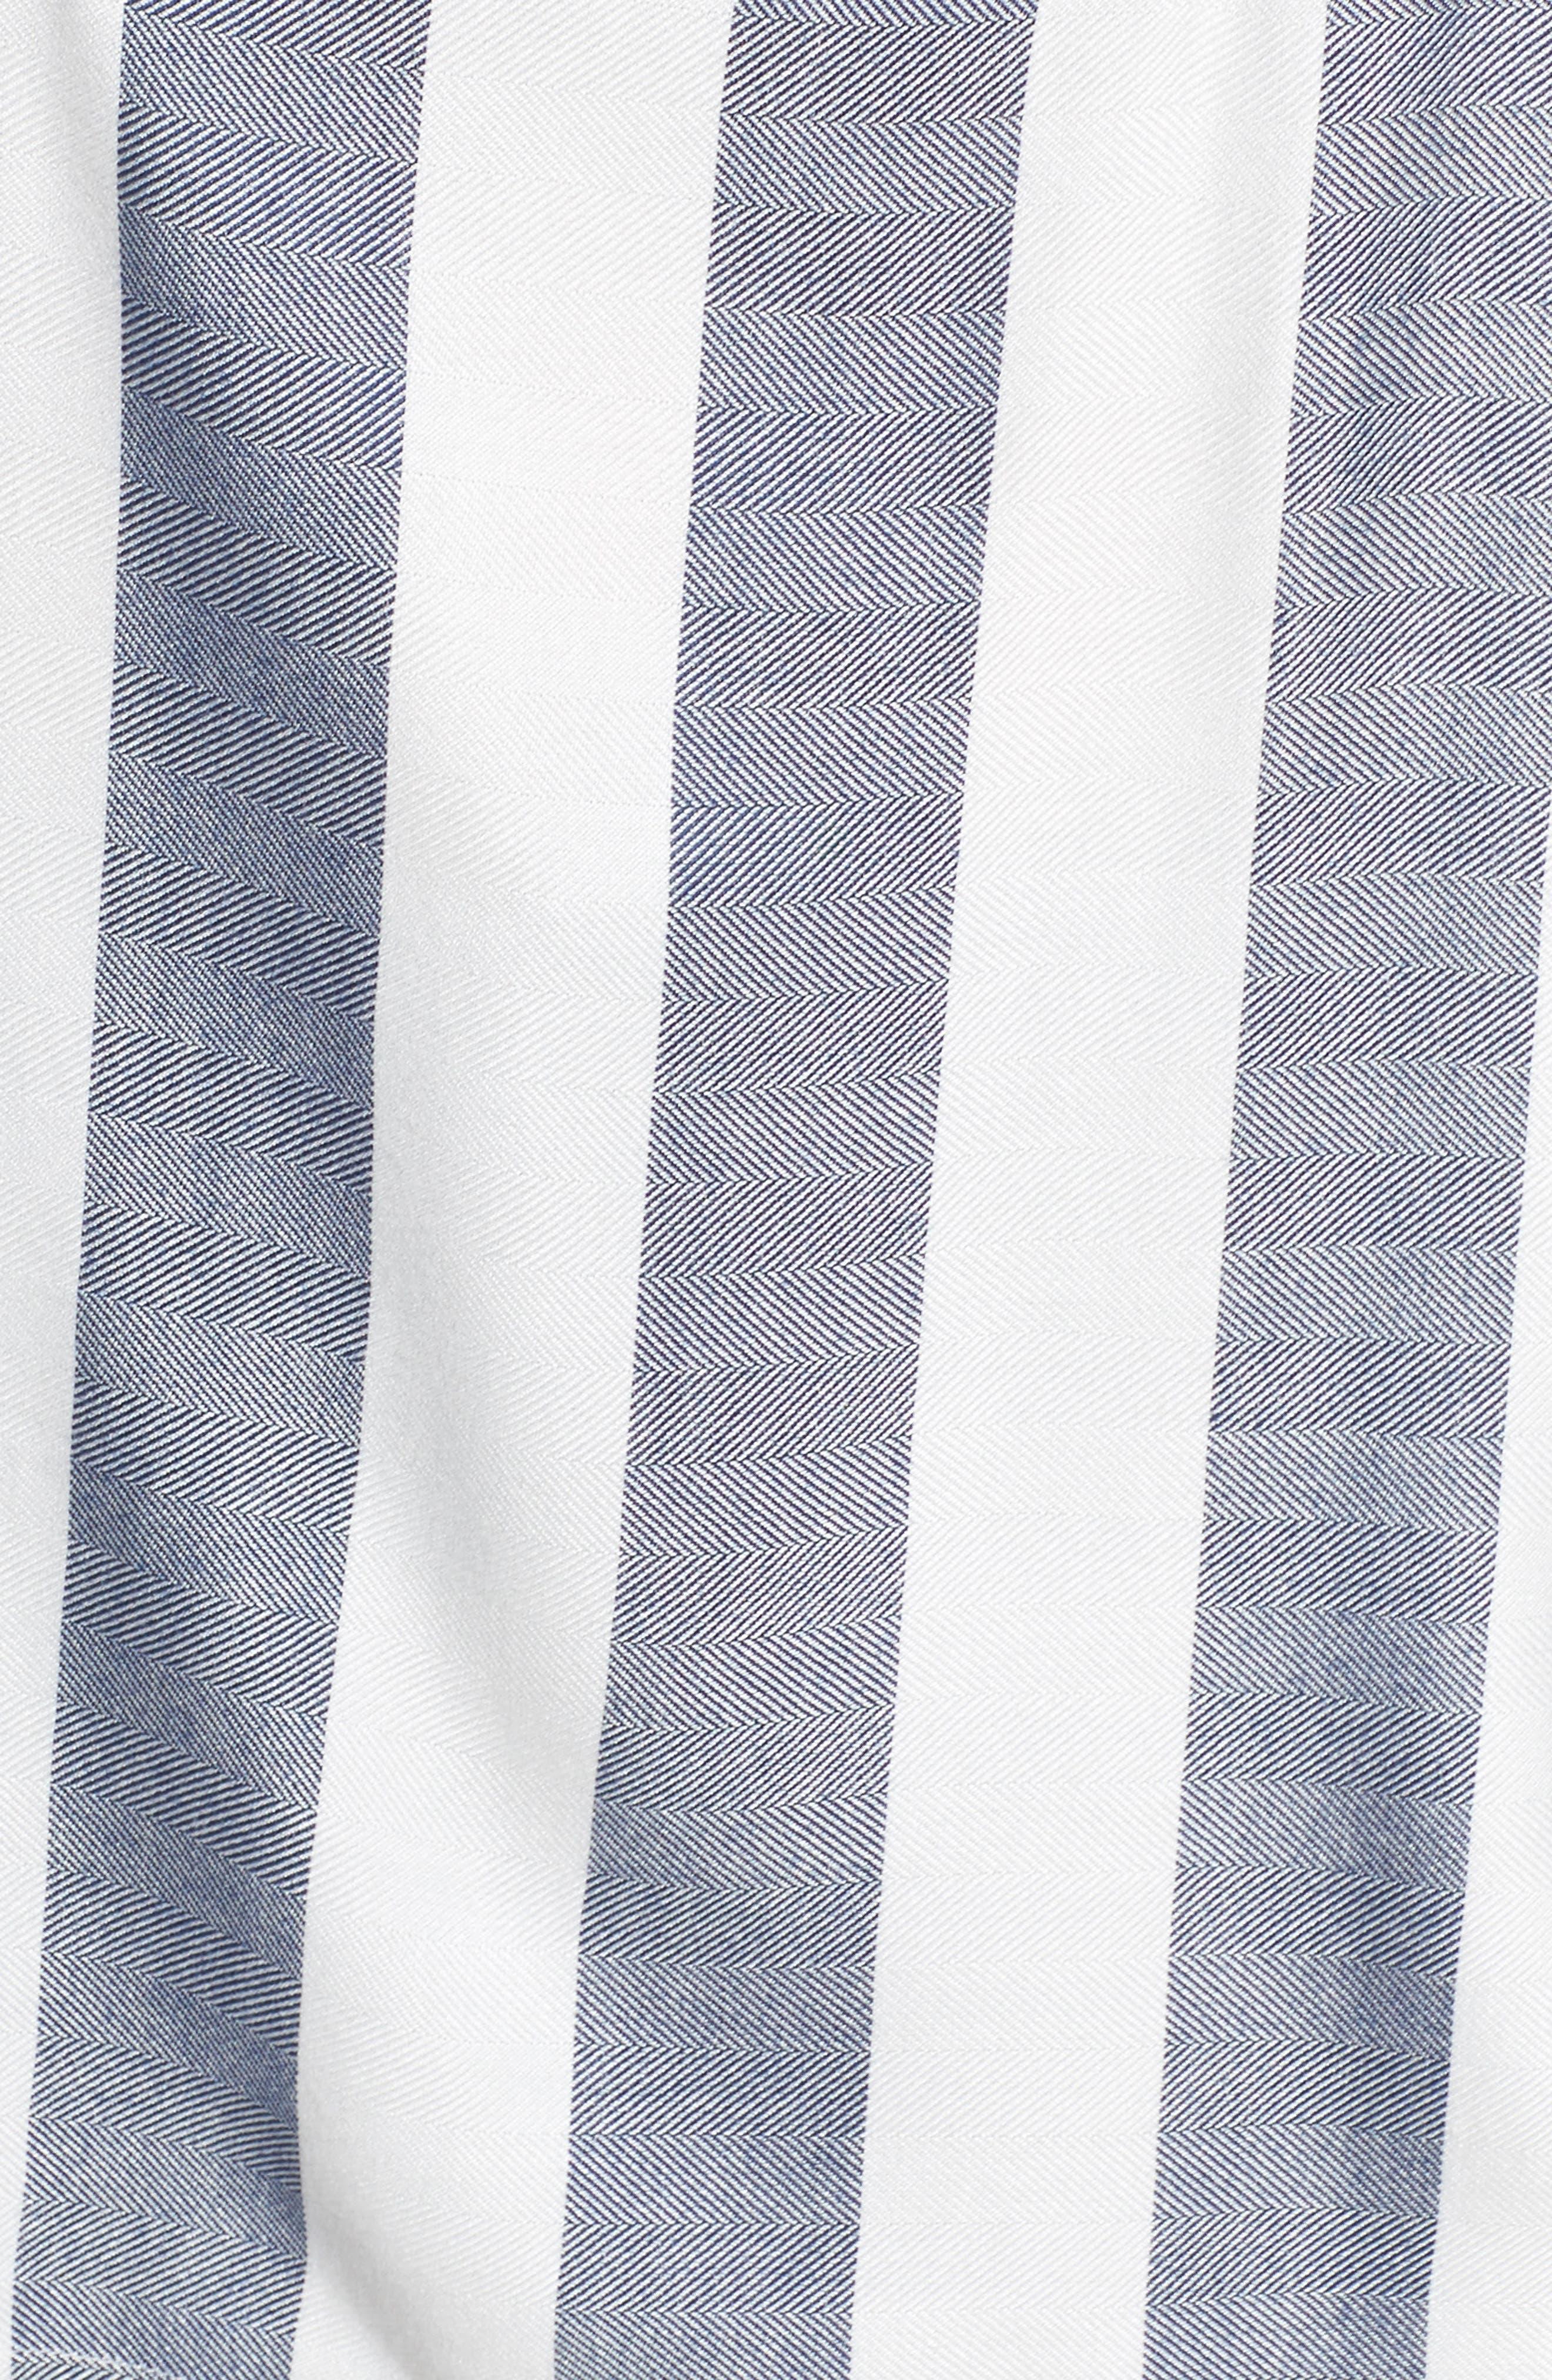 Bell Sleeve Stripe Top,                             Alternate thumbnail 5, color,                             Twilight Sky